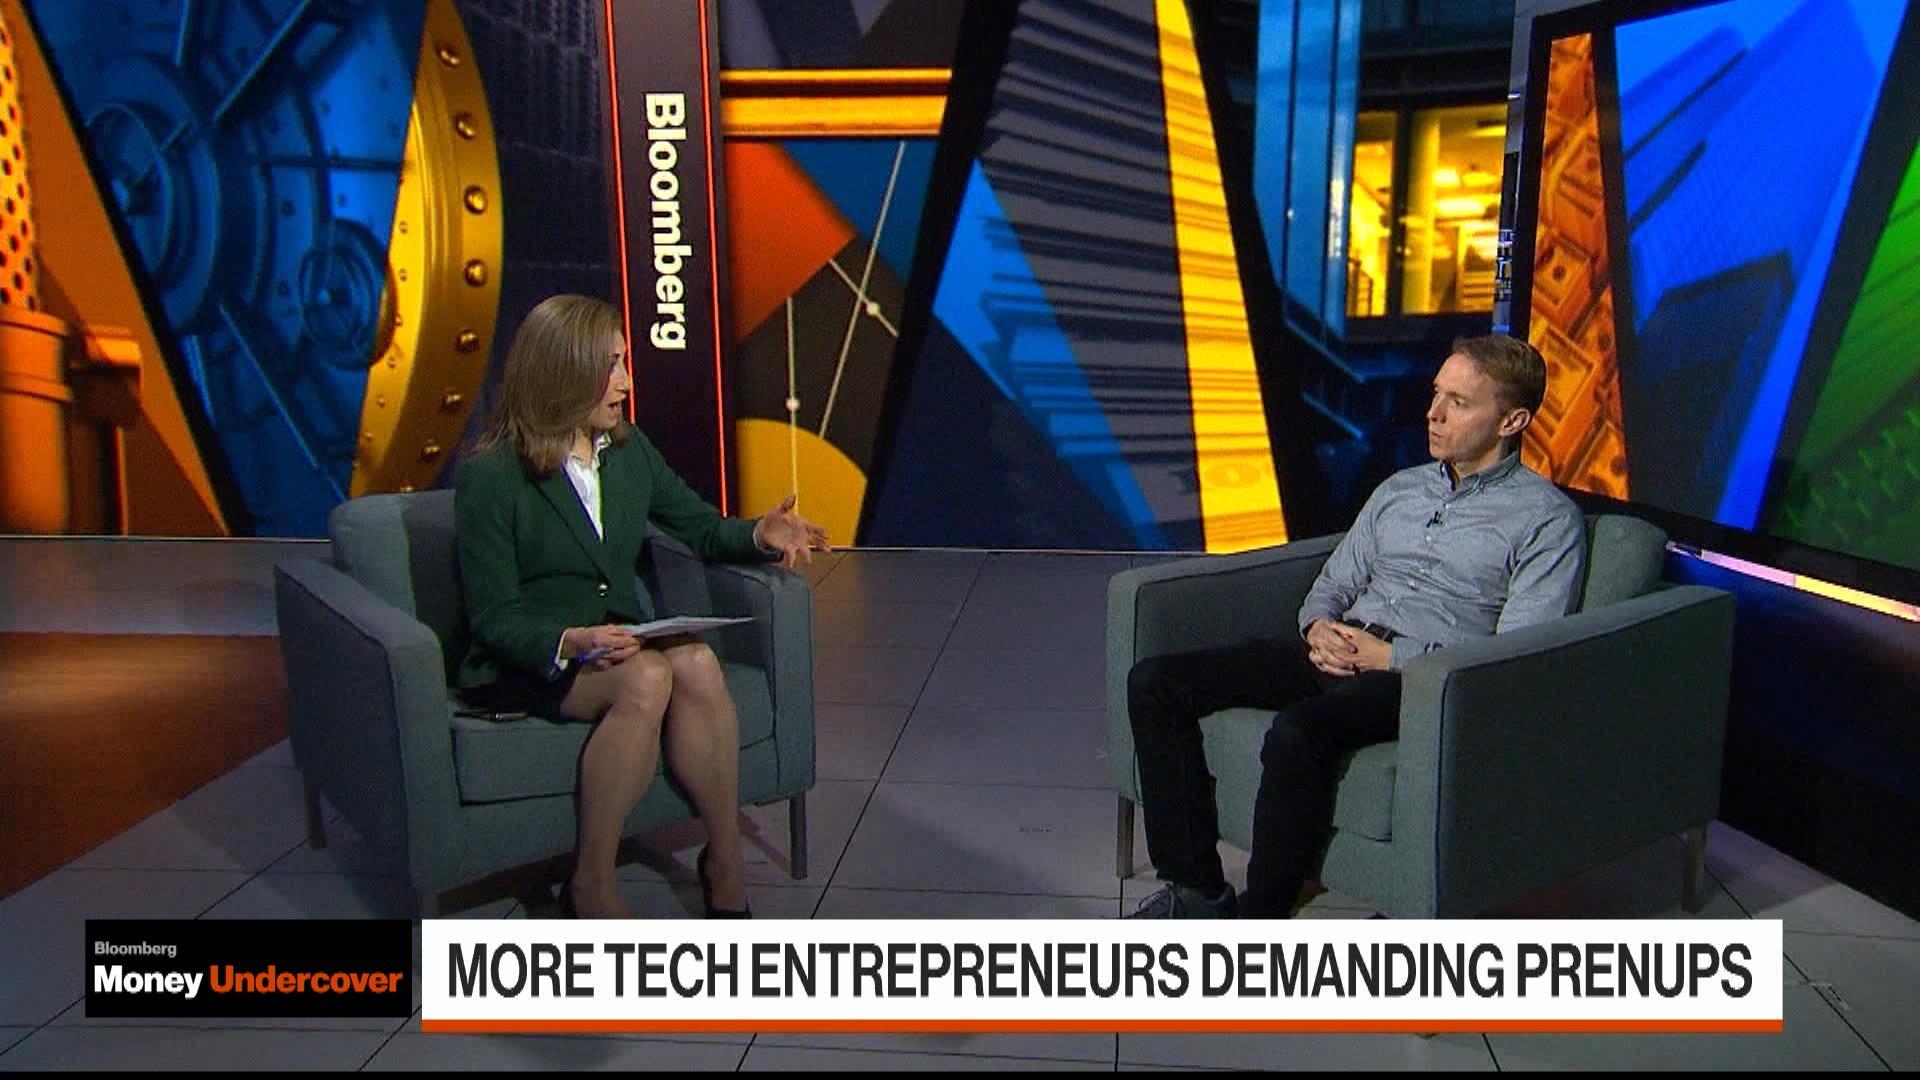 Why More Tech Entrepreneurs Are Demanding Prenups